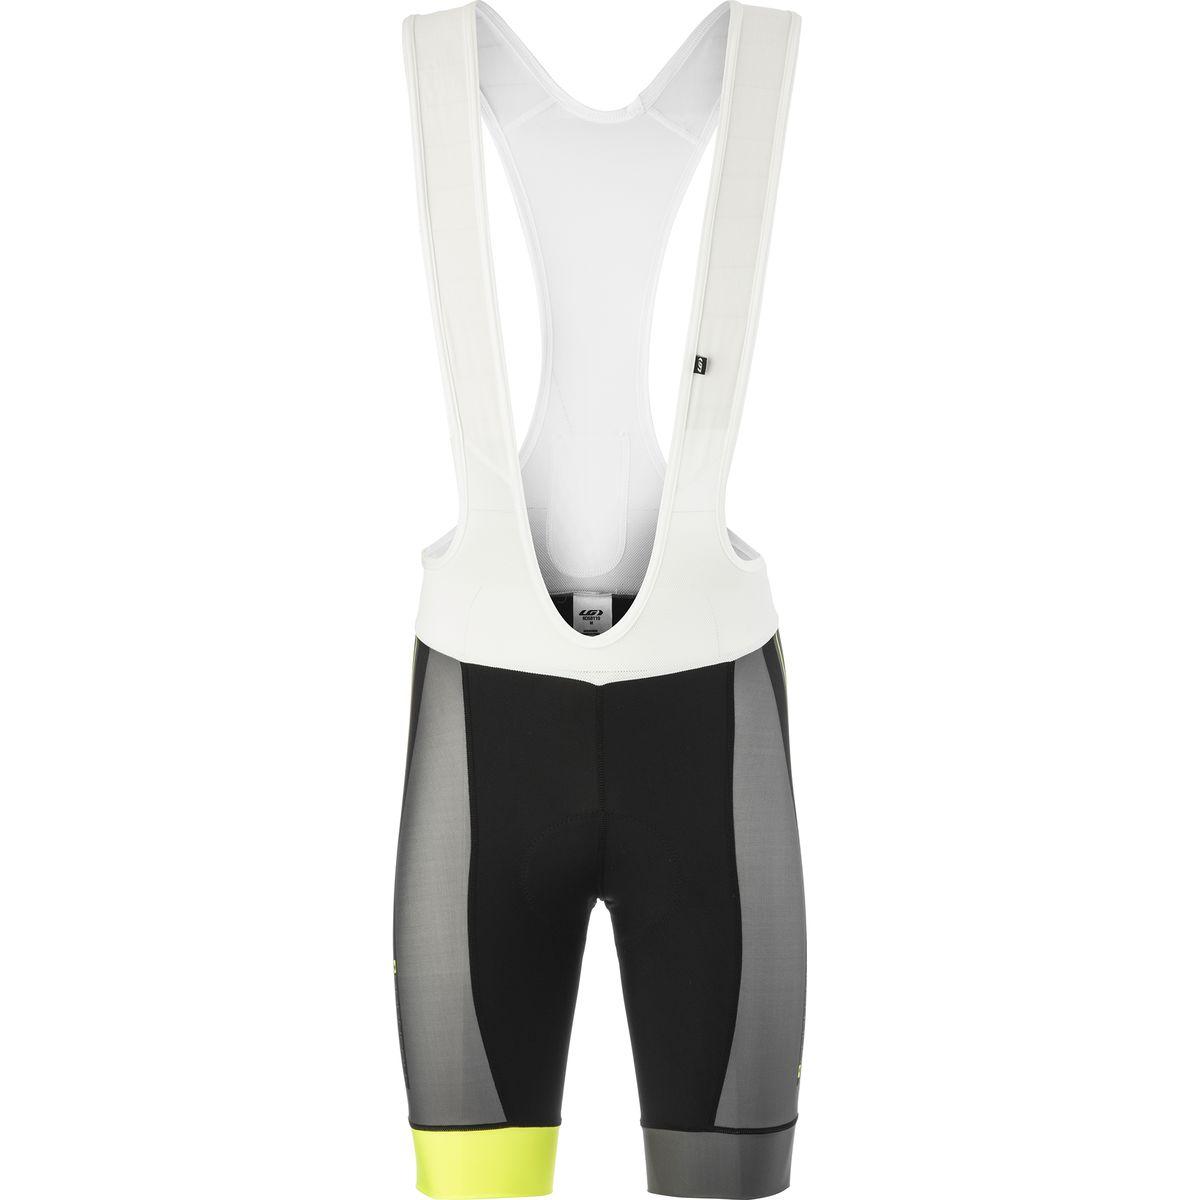 Louis Garneau Equipe 1.6 Bib Short - Men's